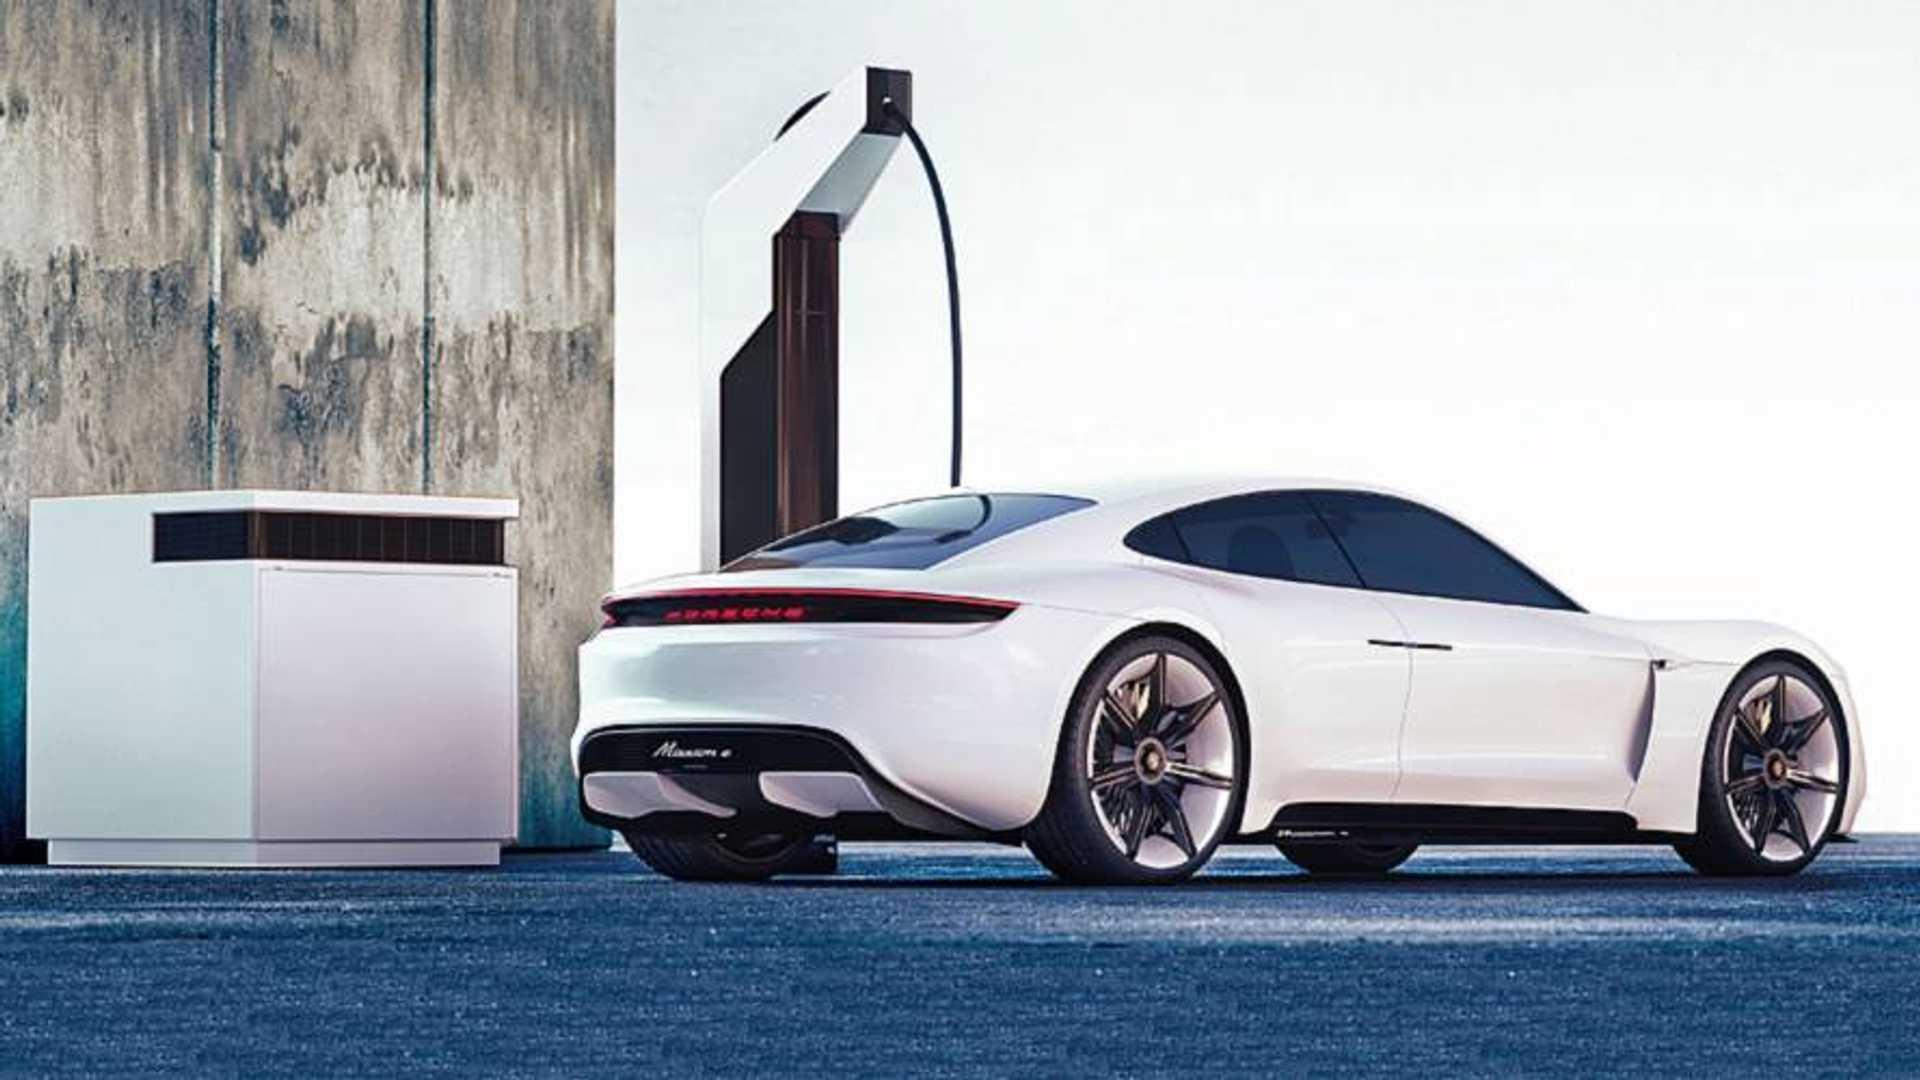 Porsche creates fast-charging 'pit-stop' parking bays